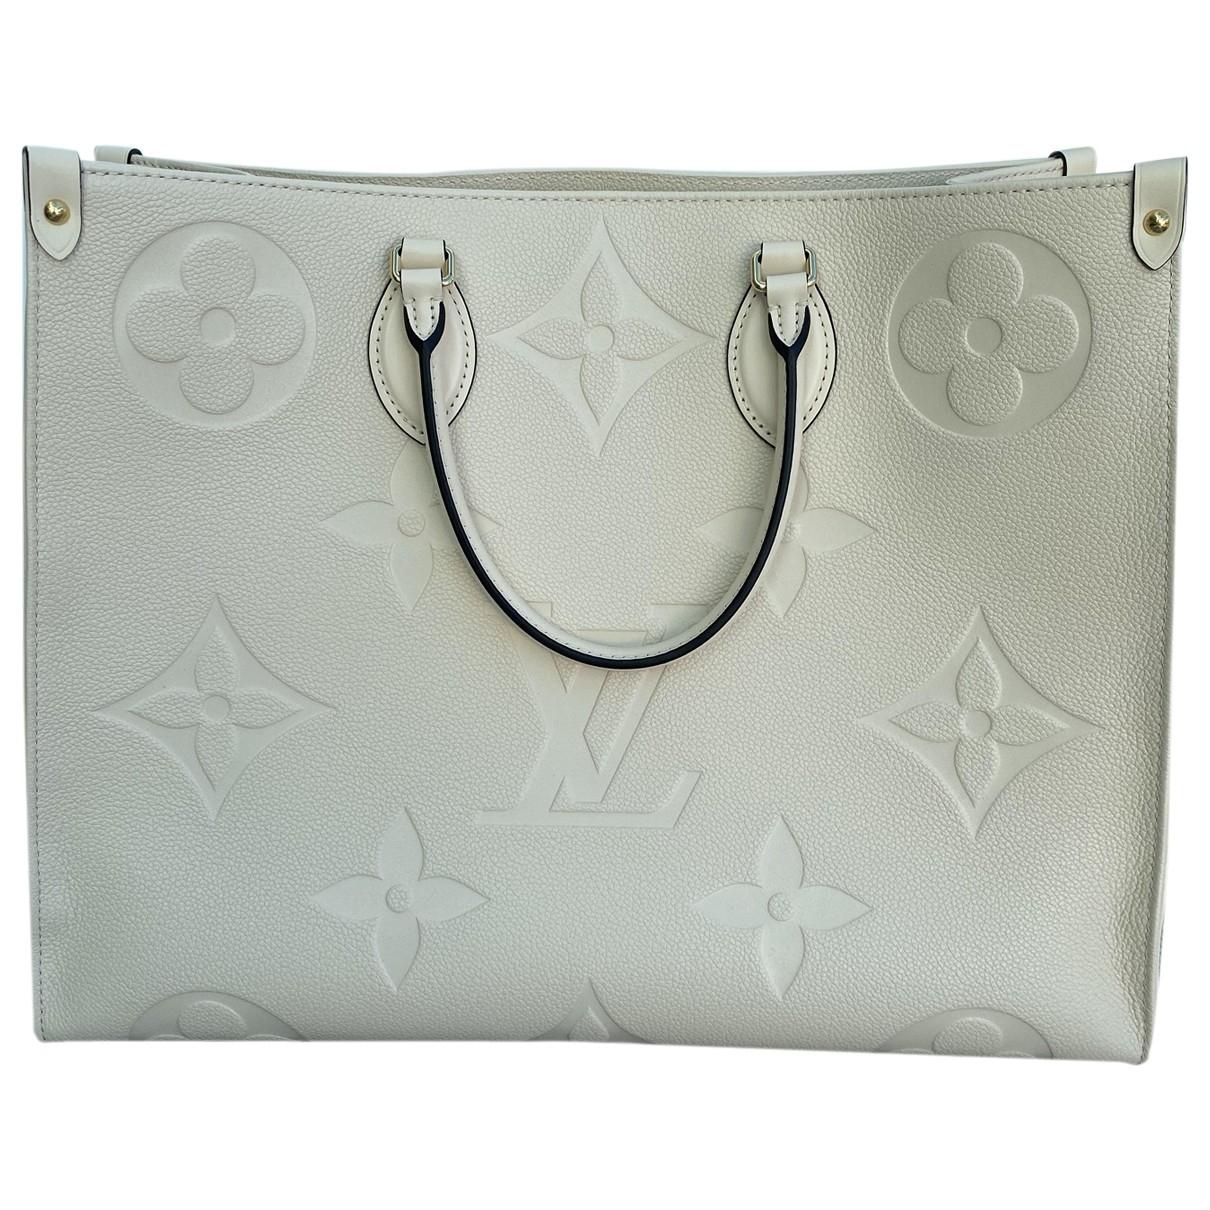 Louis Vuitton - Sac a main Onthego pour femme en cuir - blanc